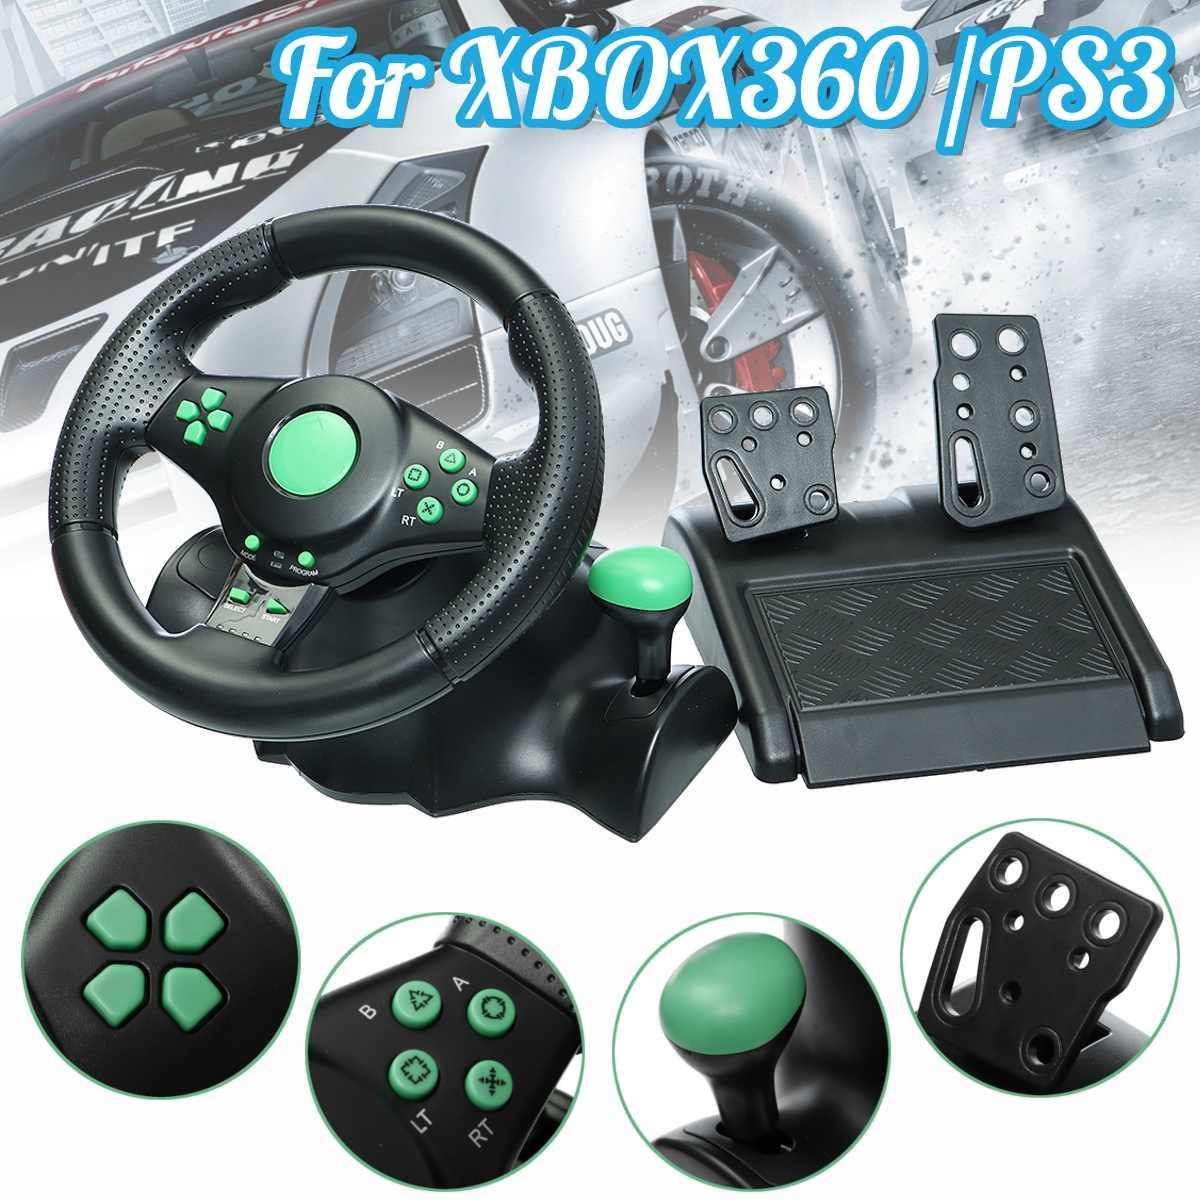 Gaming Vibration Racing Steering Wheel and Pedals For XBOX360 / For PS3 / For PS2 / PCGaming Vibration Racing Steering Wheel and Pedals For XBOX360 / For PS3 / For PS2 / PC